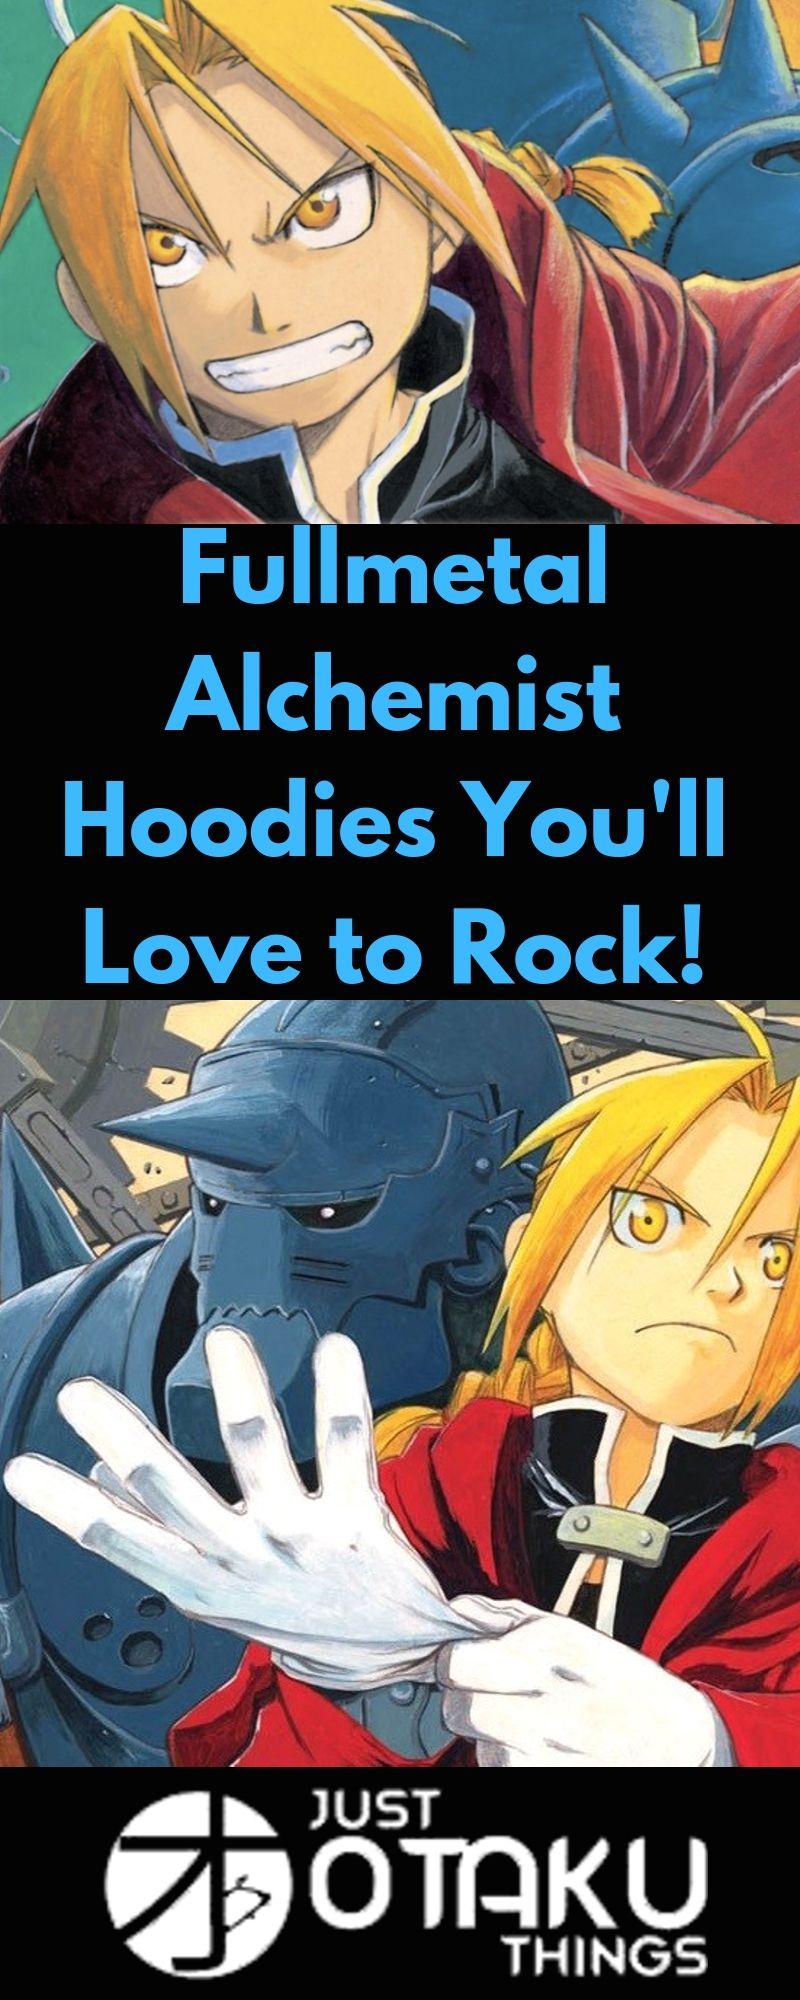 Get Ready to Look Fresh in these Fullmetal Alchemist